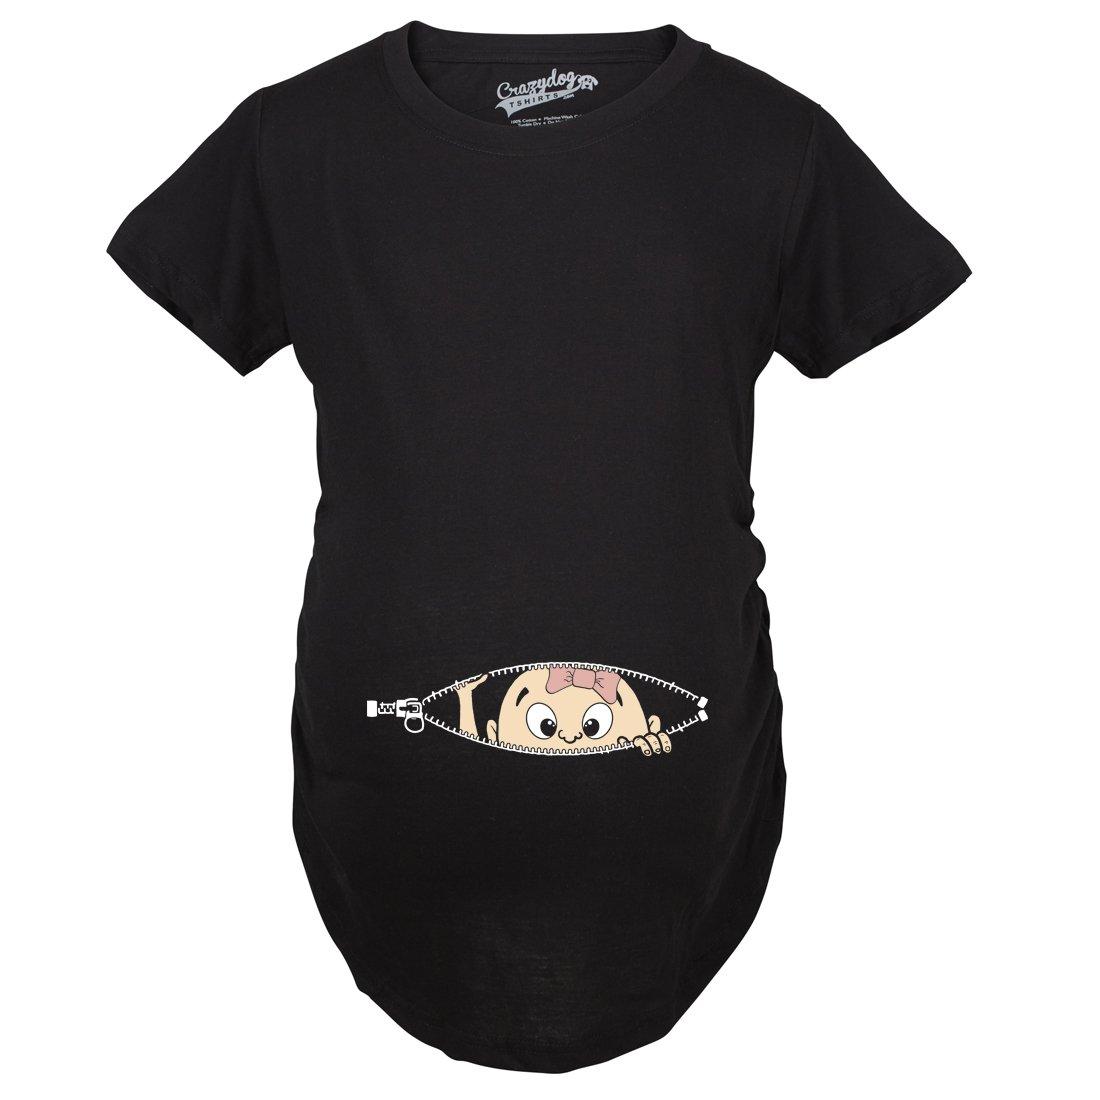 Crazy Dog Tshirts Maternity Baby Girl Peeking with Pink Bow Shirt Funny Cute Pregnancy T Shirt Damen